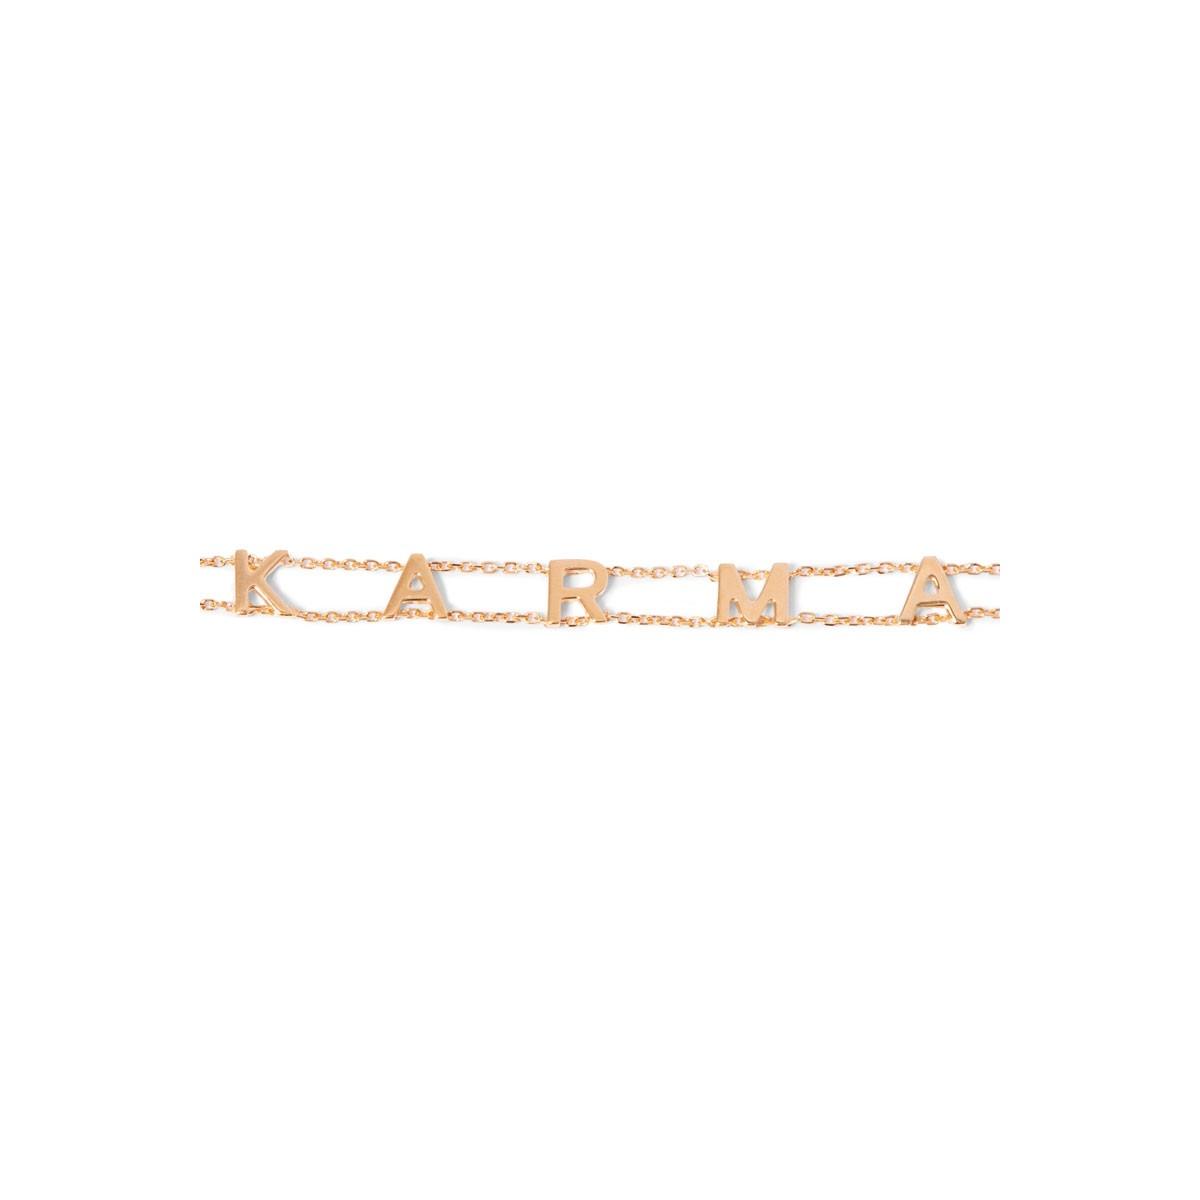 Bracelet Letters Name It